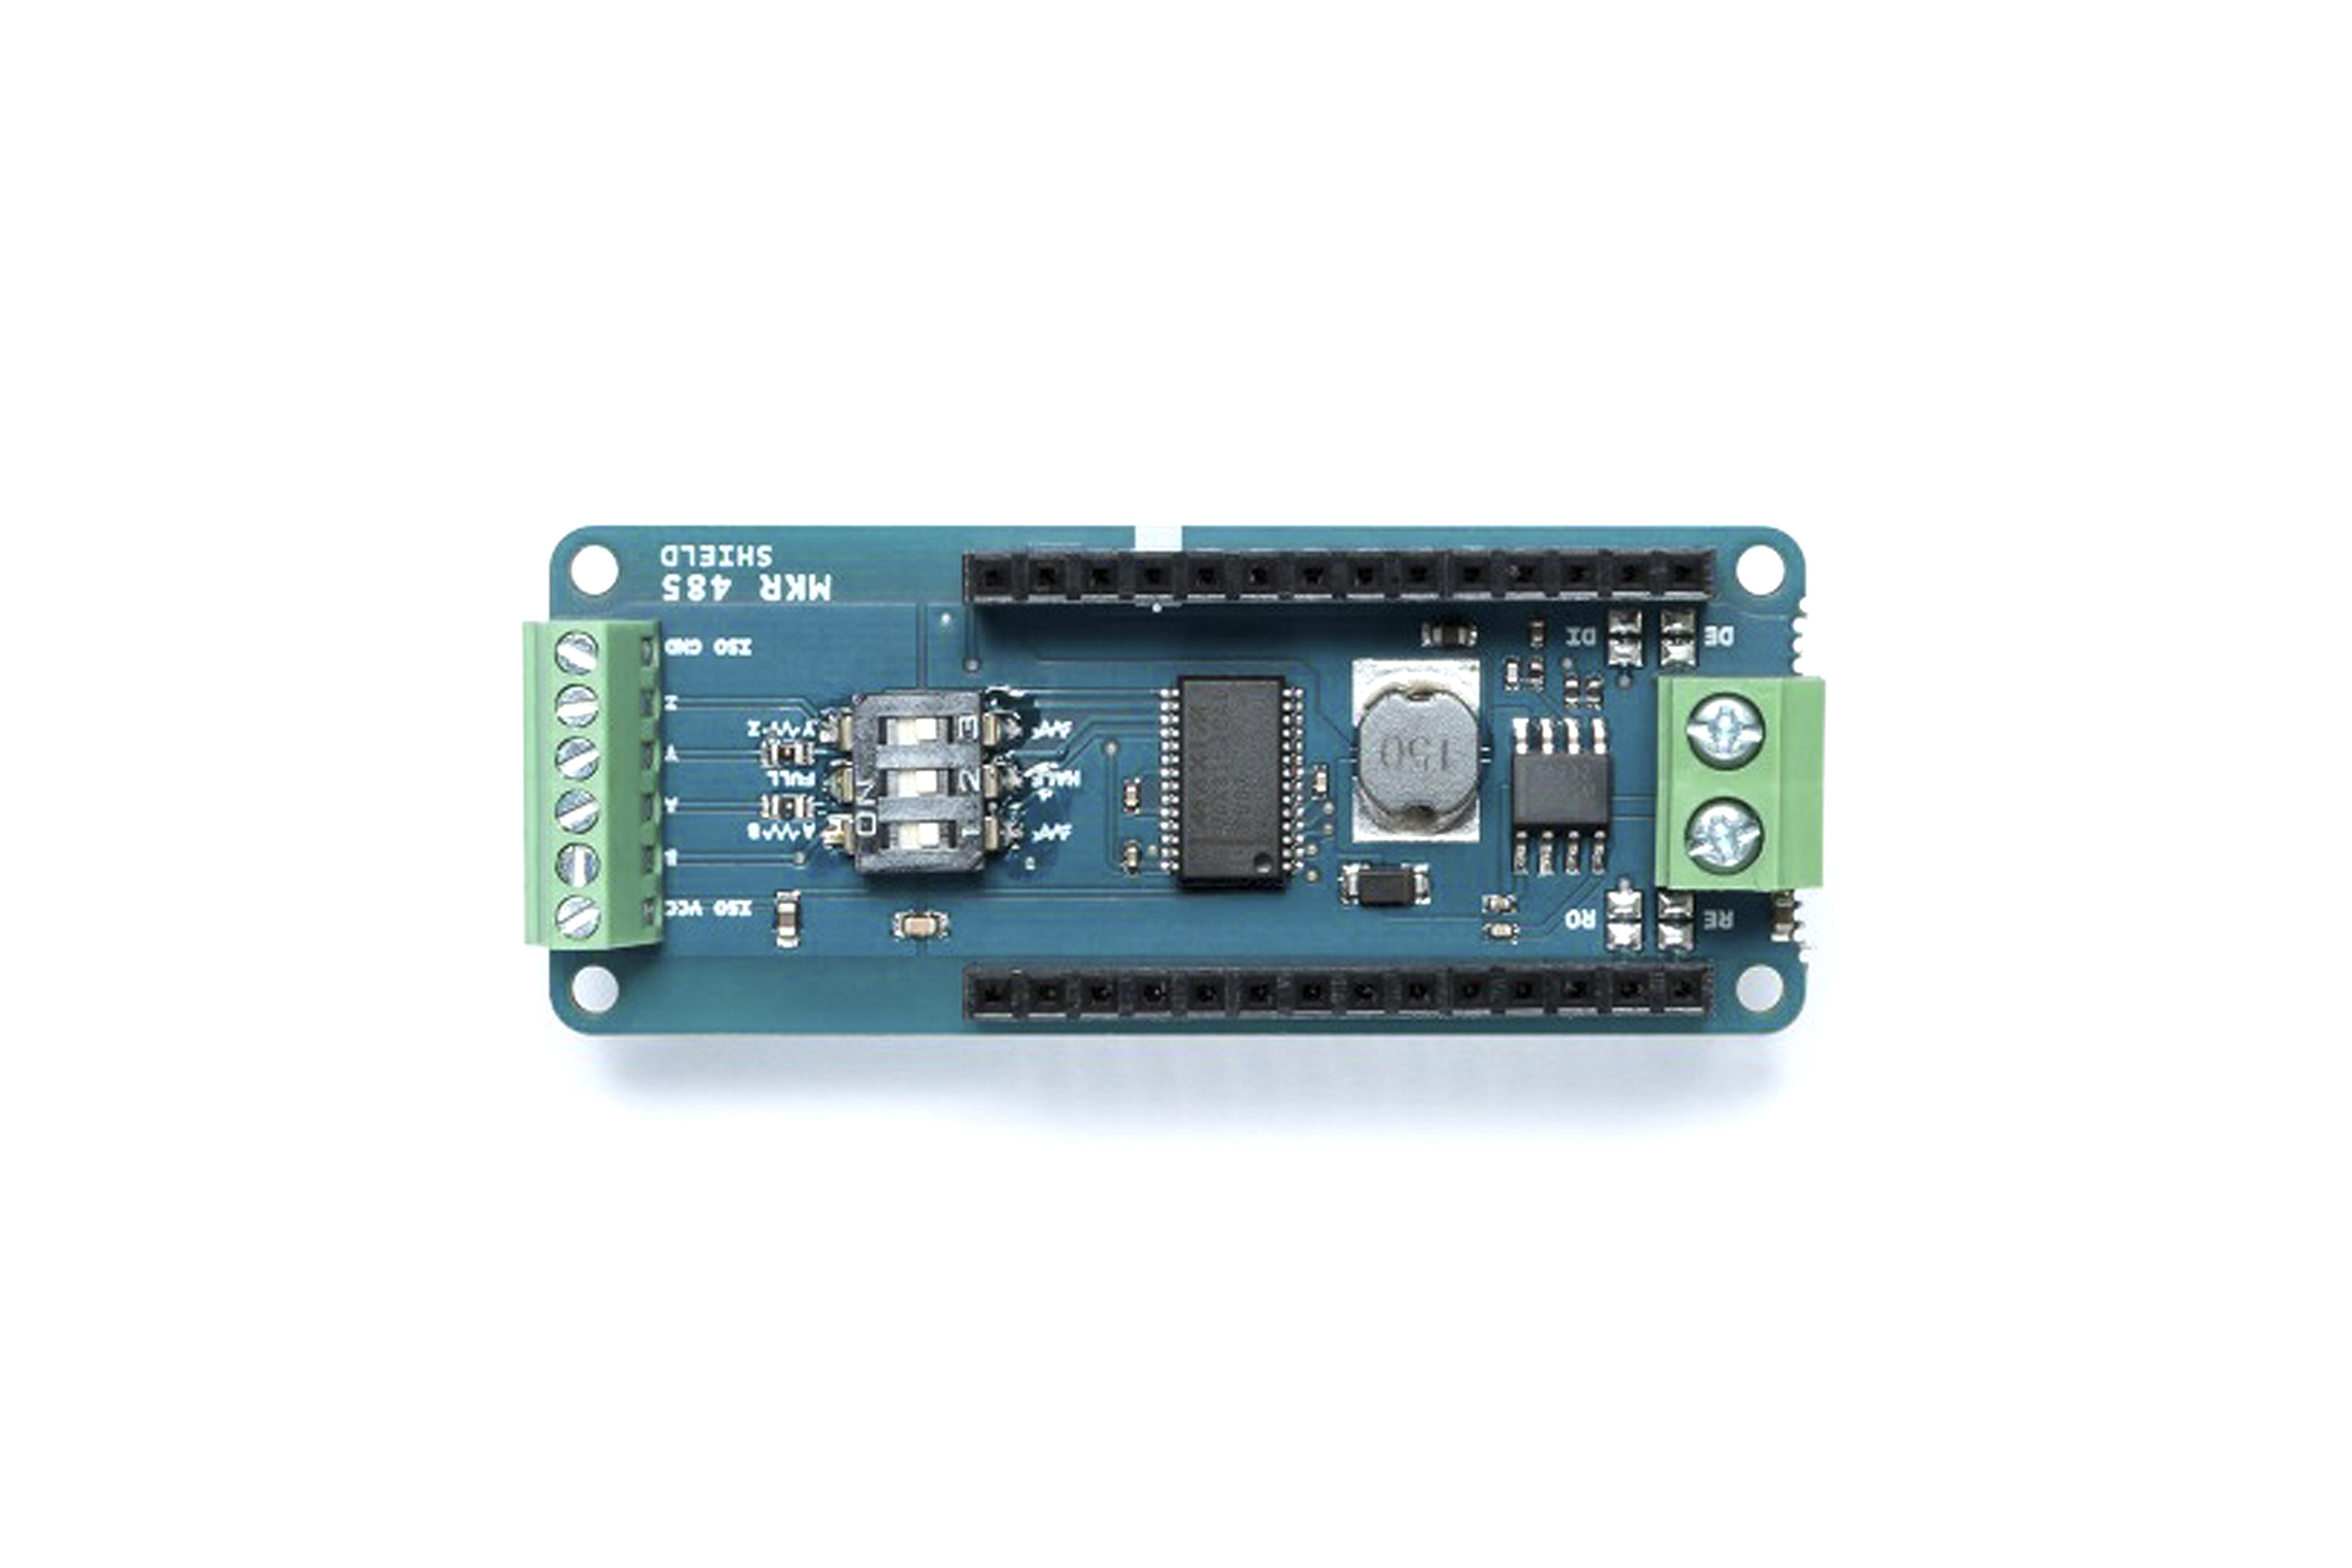 Arduino Mkr 485 Shield